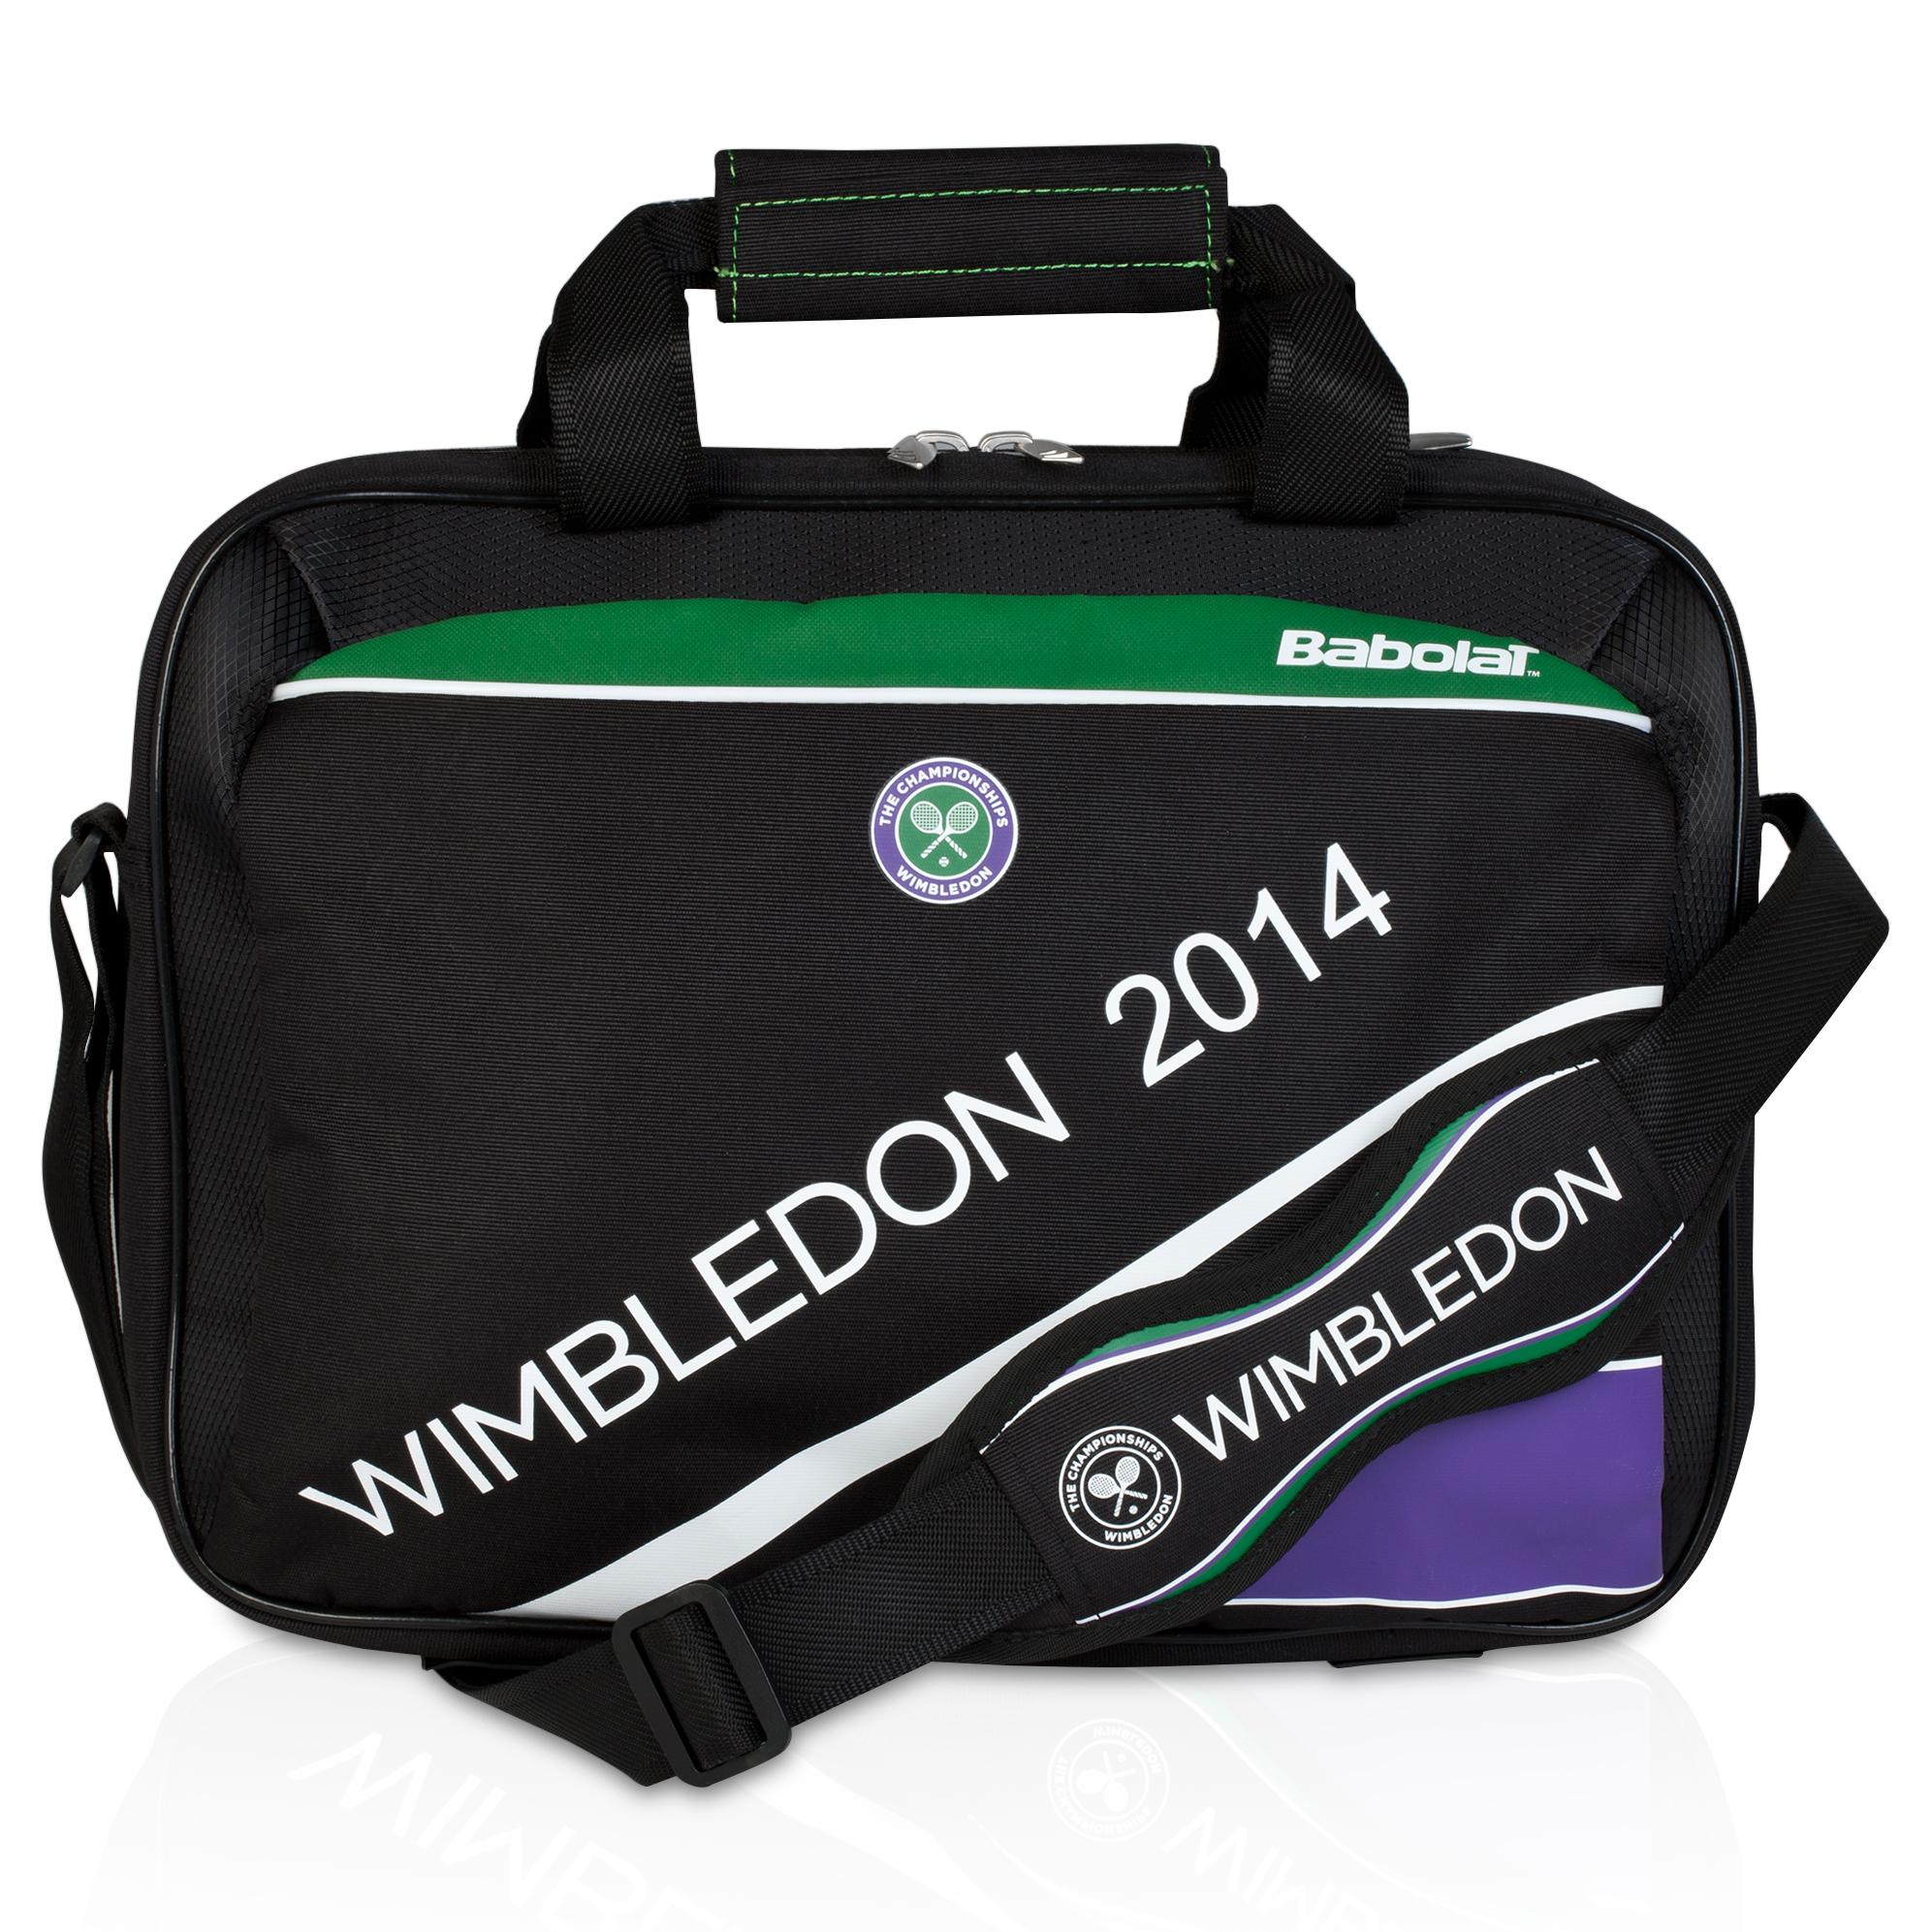 Wimbledon 2014 Babolat Briefcase